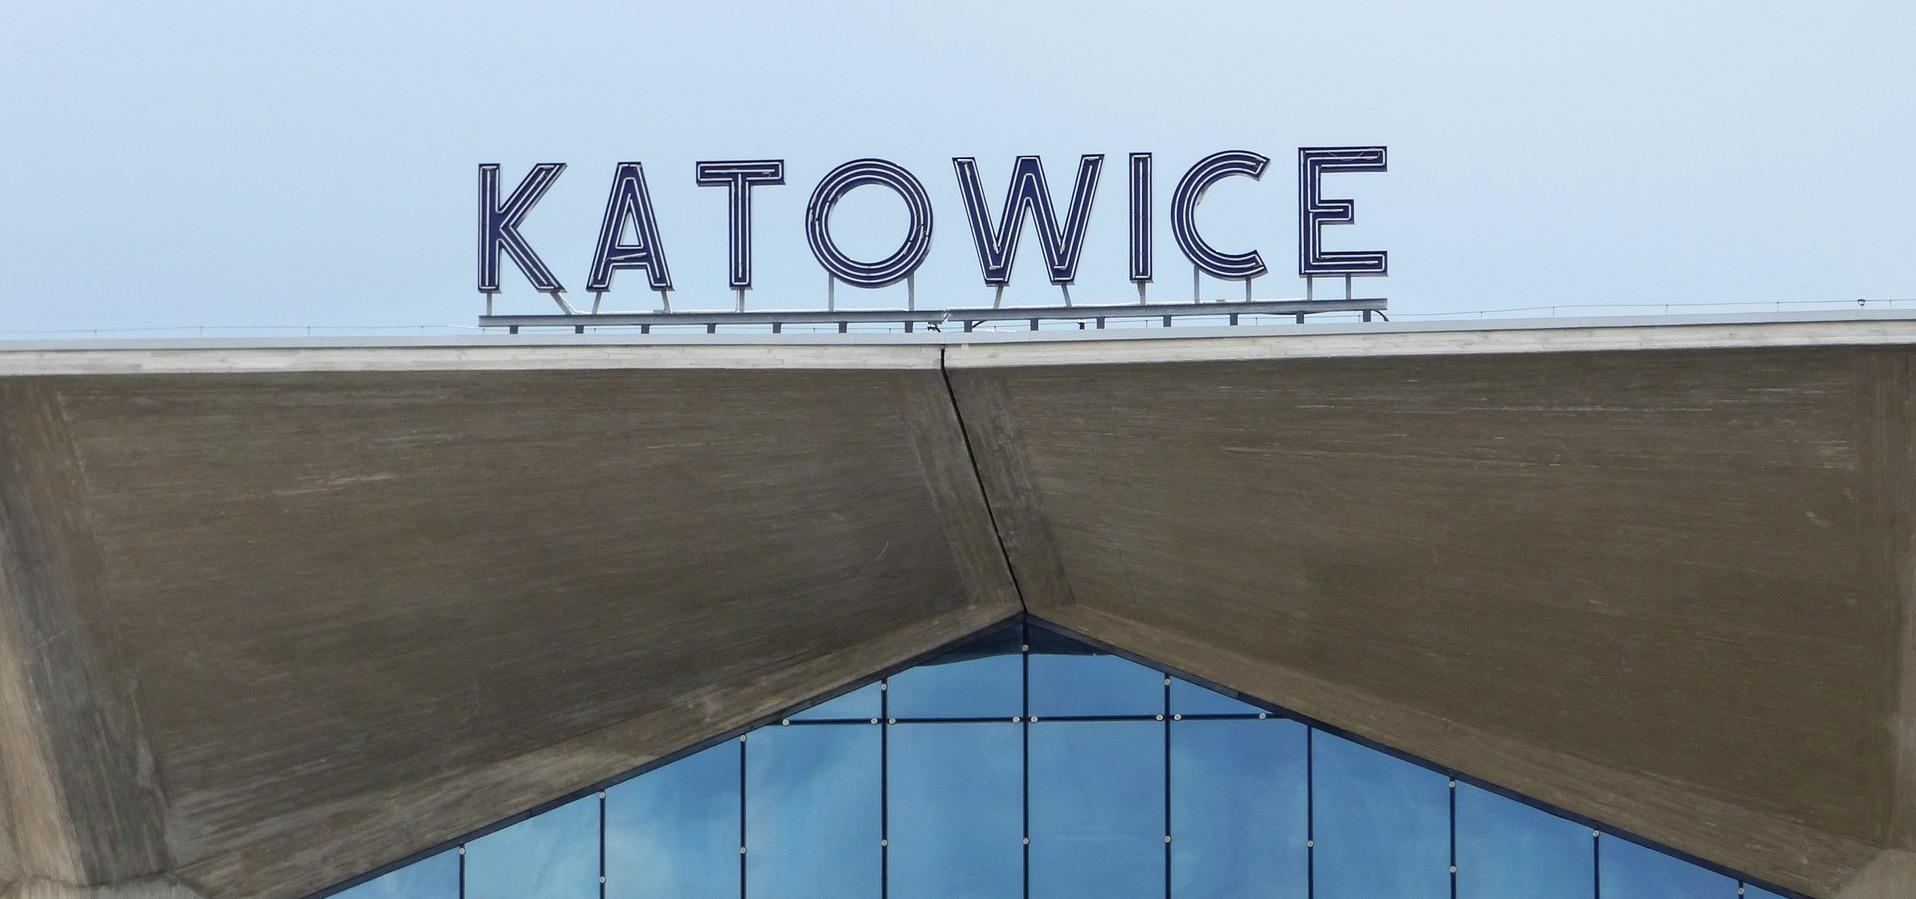 image of the Katowice train station